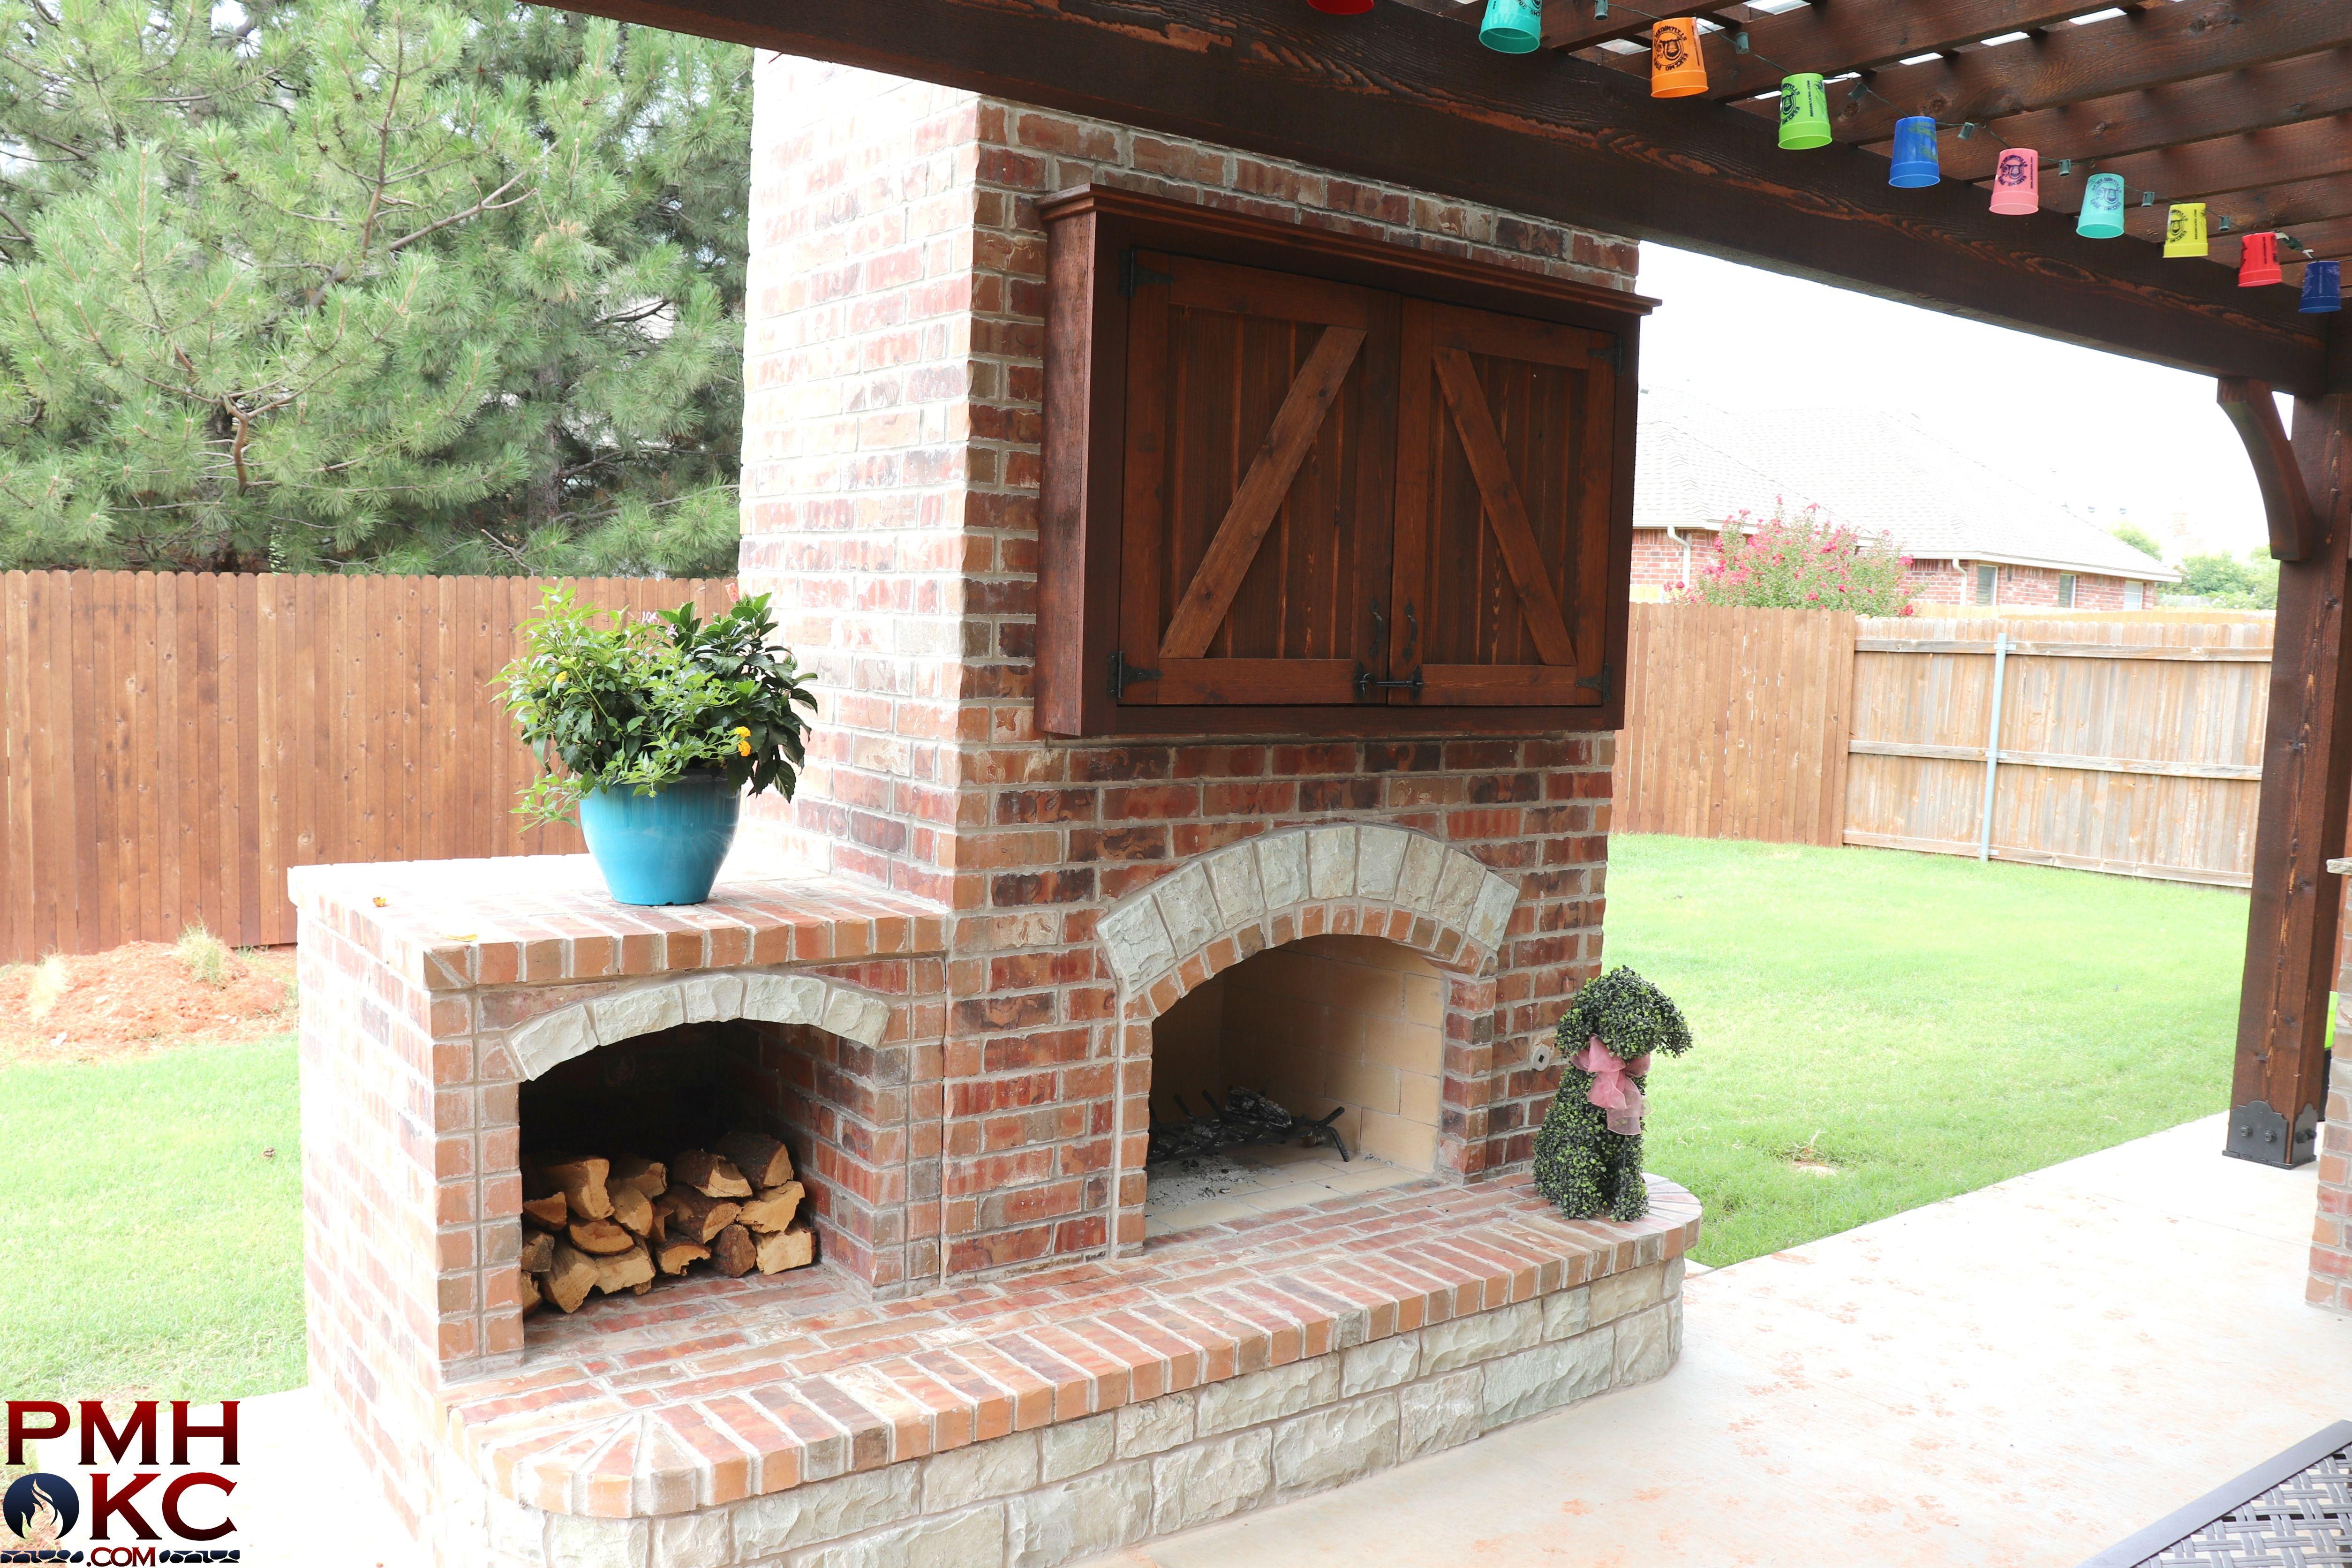 Custom Made Brick Fireplace With A Firewood Holder And Tv Box In 2020 Fireplace Brick Fireplace Custom Fireplace